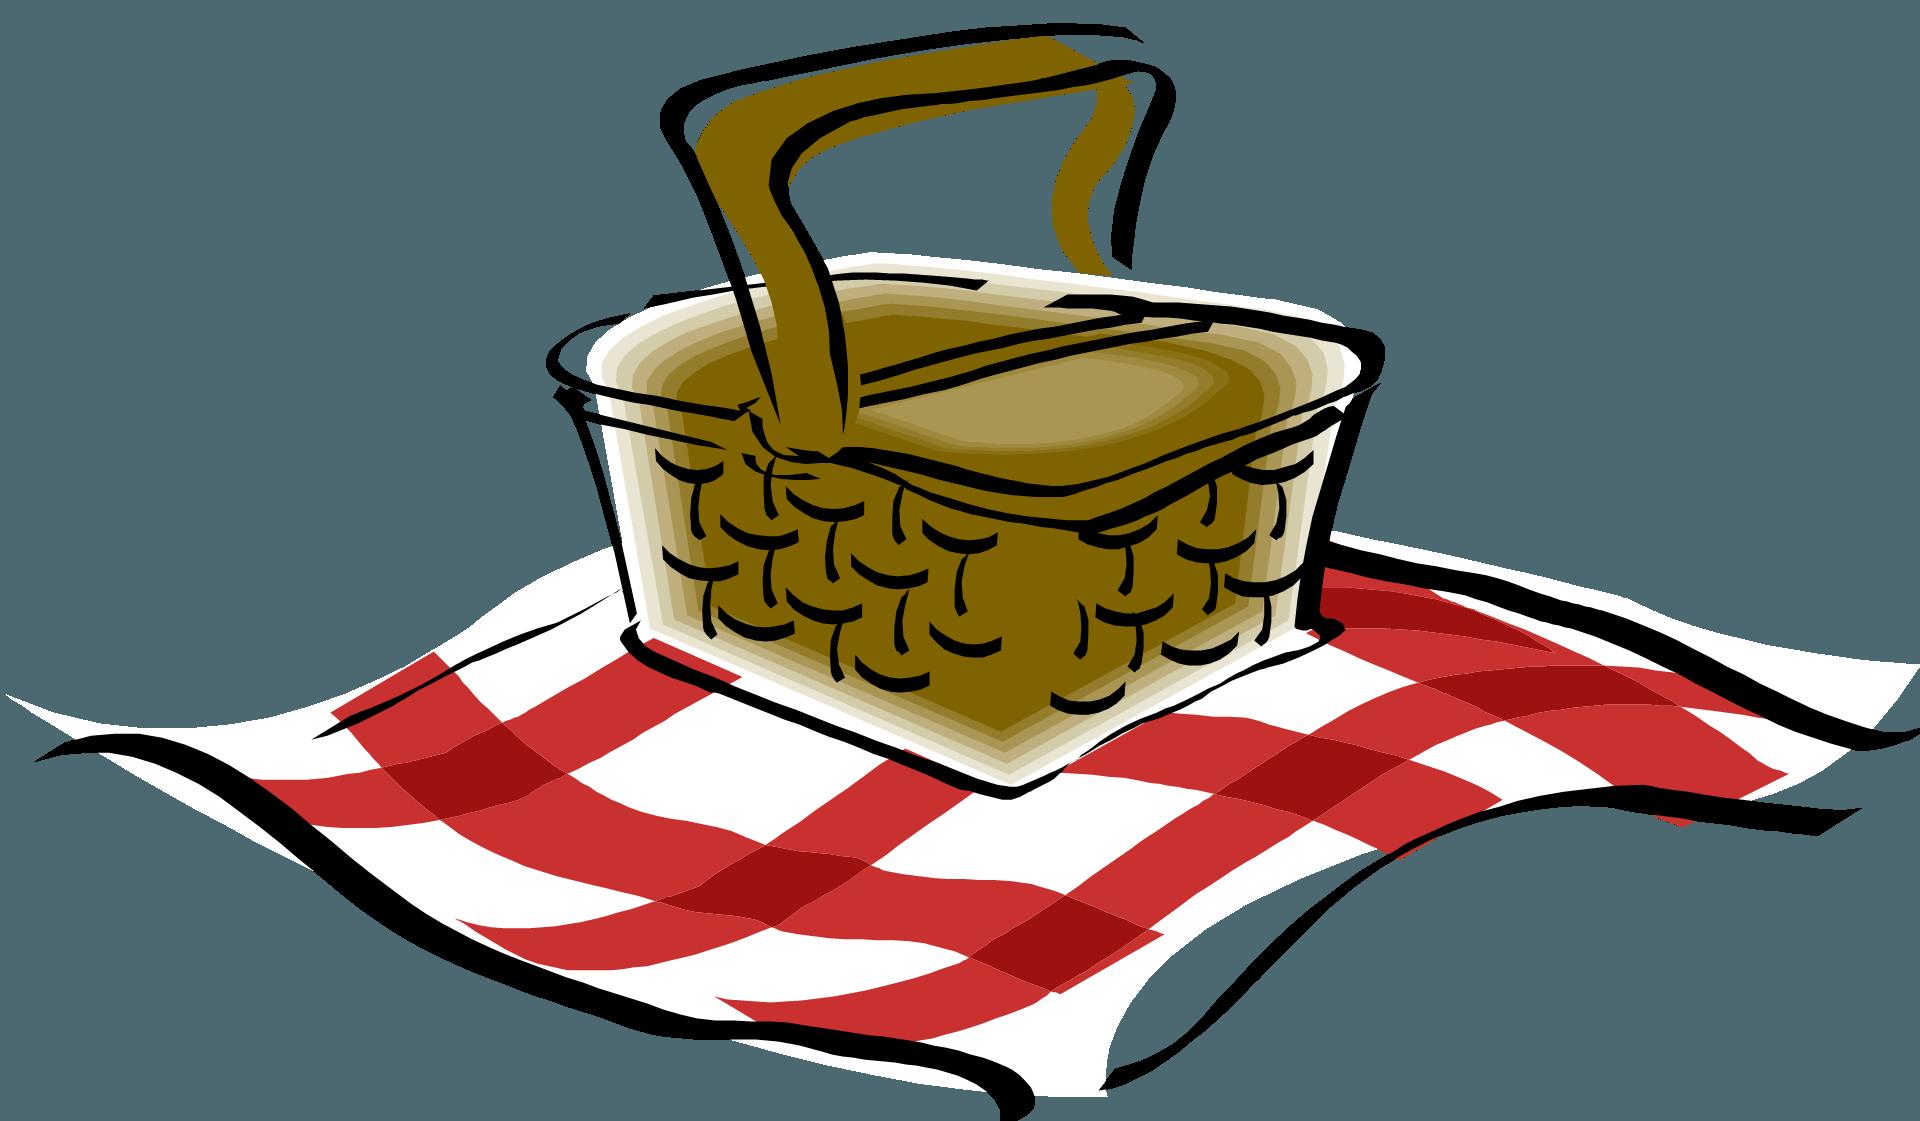 Picnic clipart june. Table clip art image